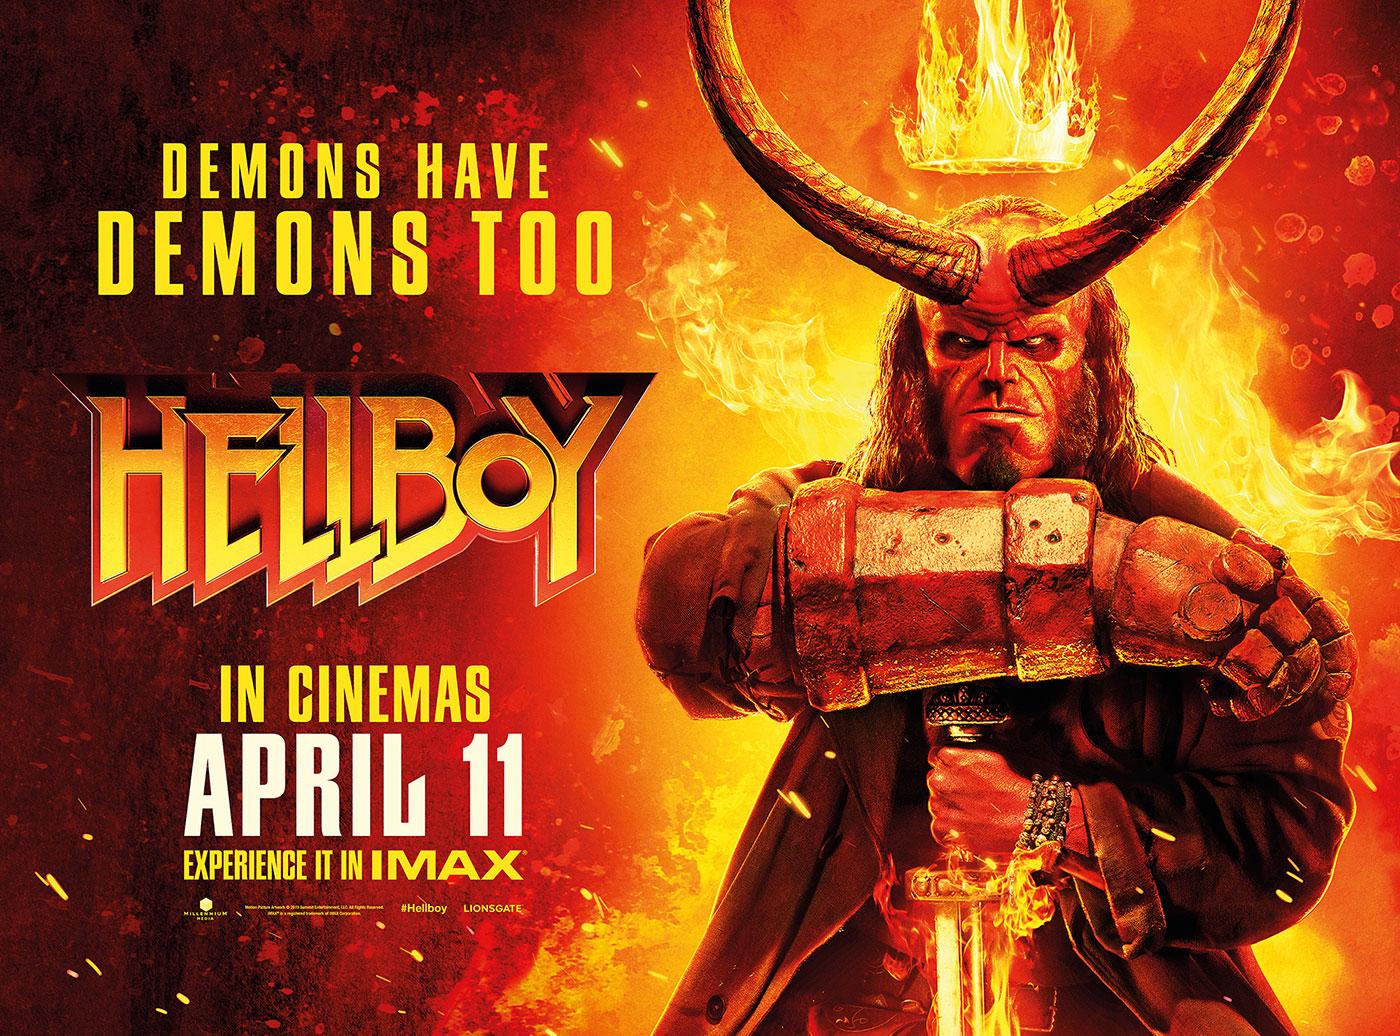 Hellboy_UK_QUAD_MASTER_CROWN_ALT_small.jpg